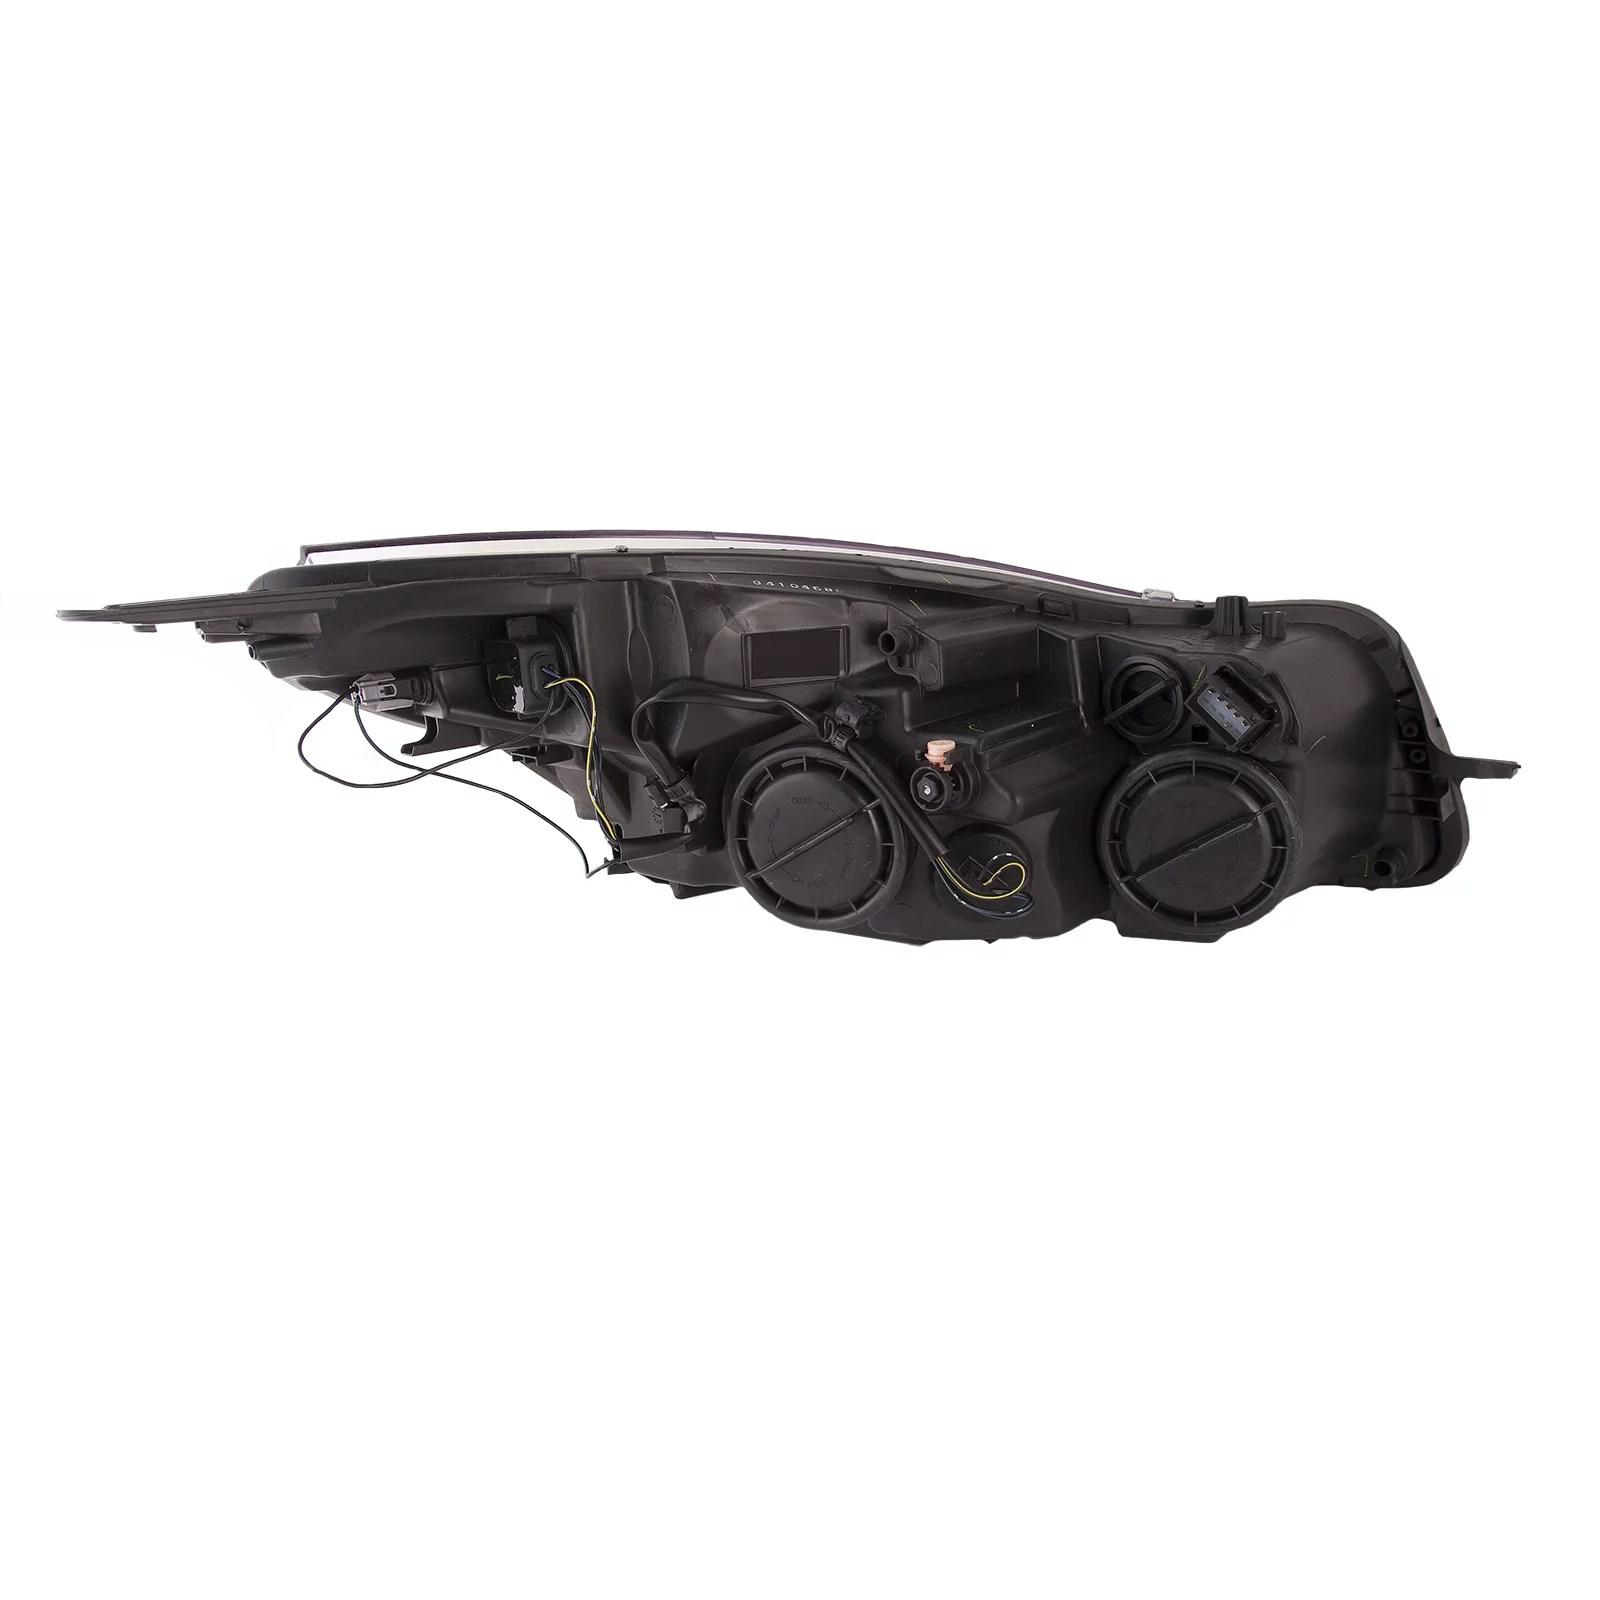 hight resolution of 2011 2014 buick regal headlight right passenger side halogen headlamp assembly walmart com